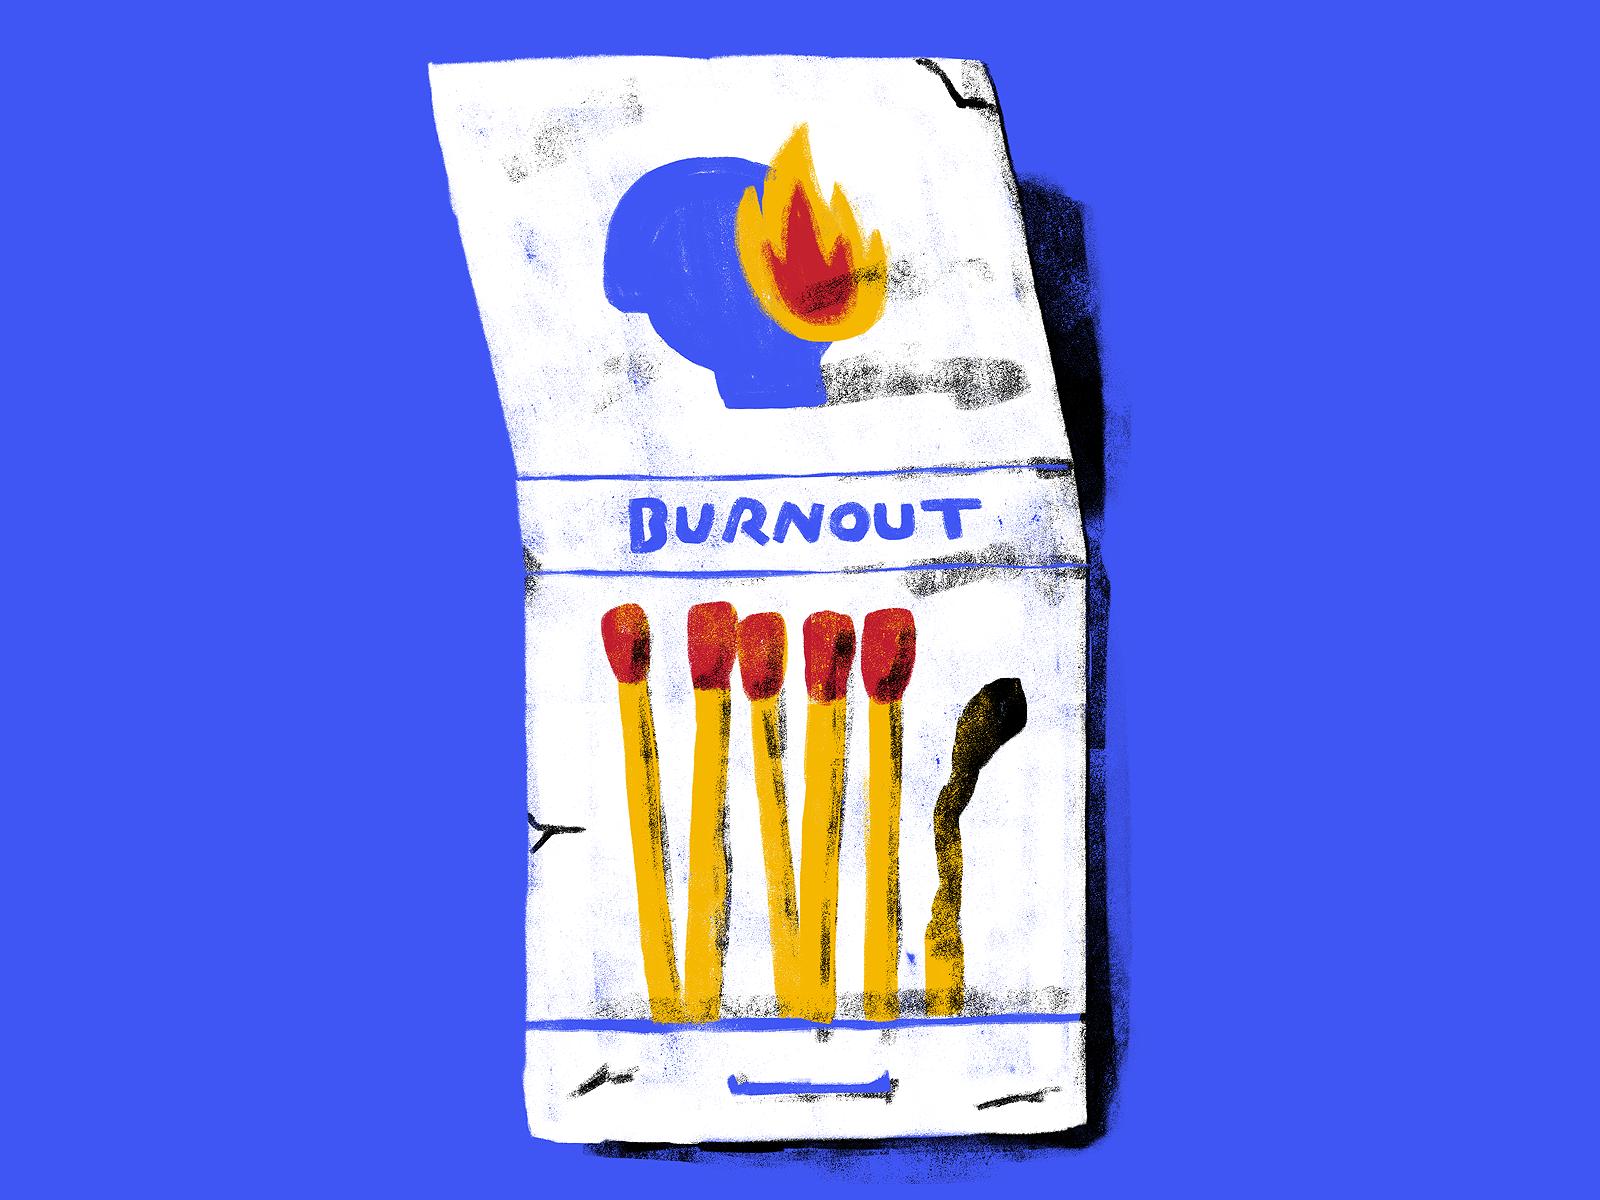 Burnout by Bruno Moncada